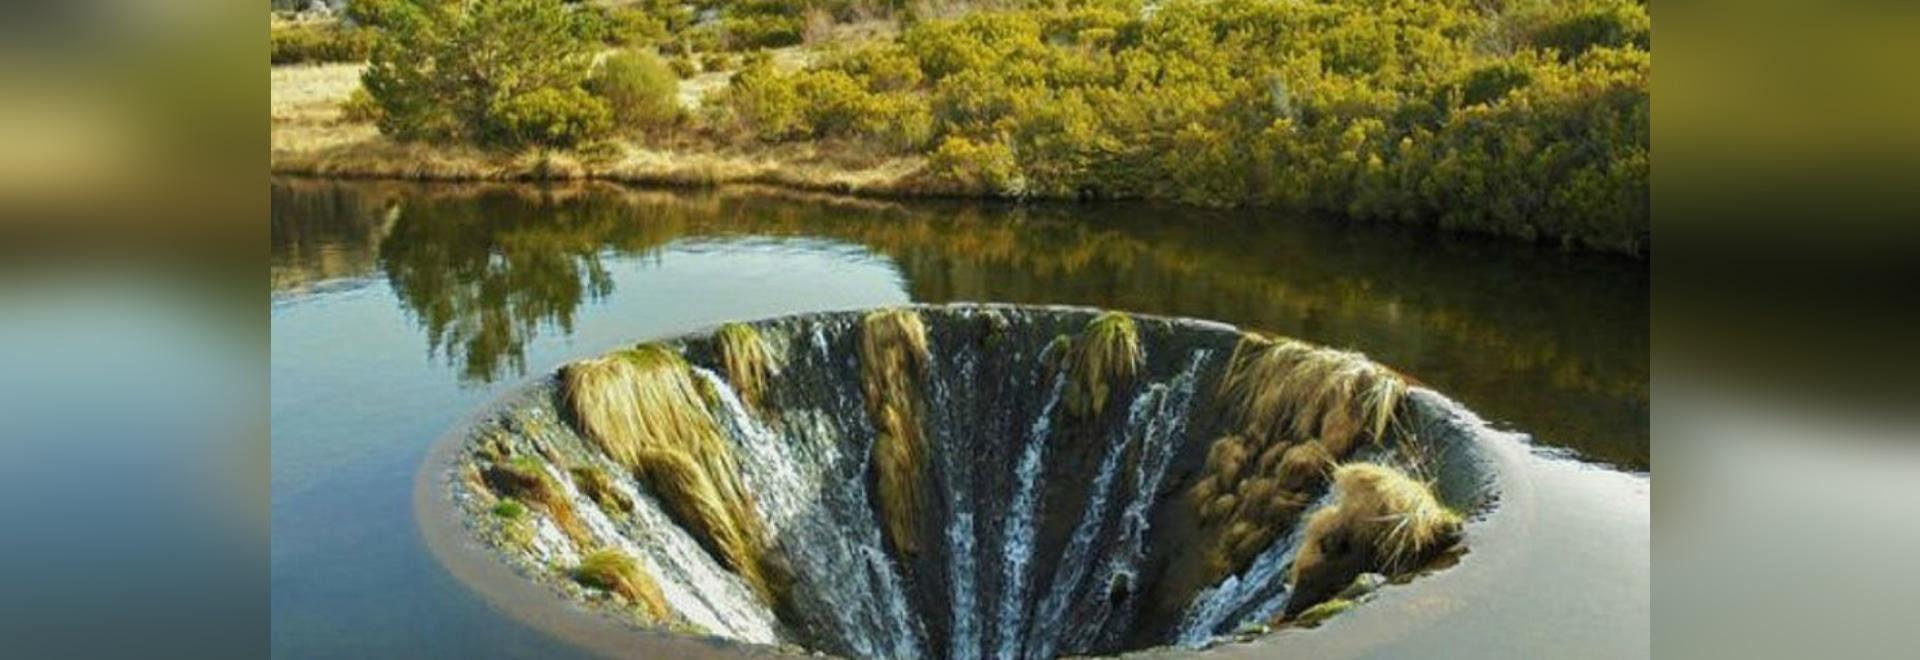 Conchos Dam Portugal